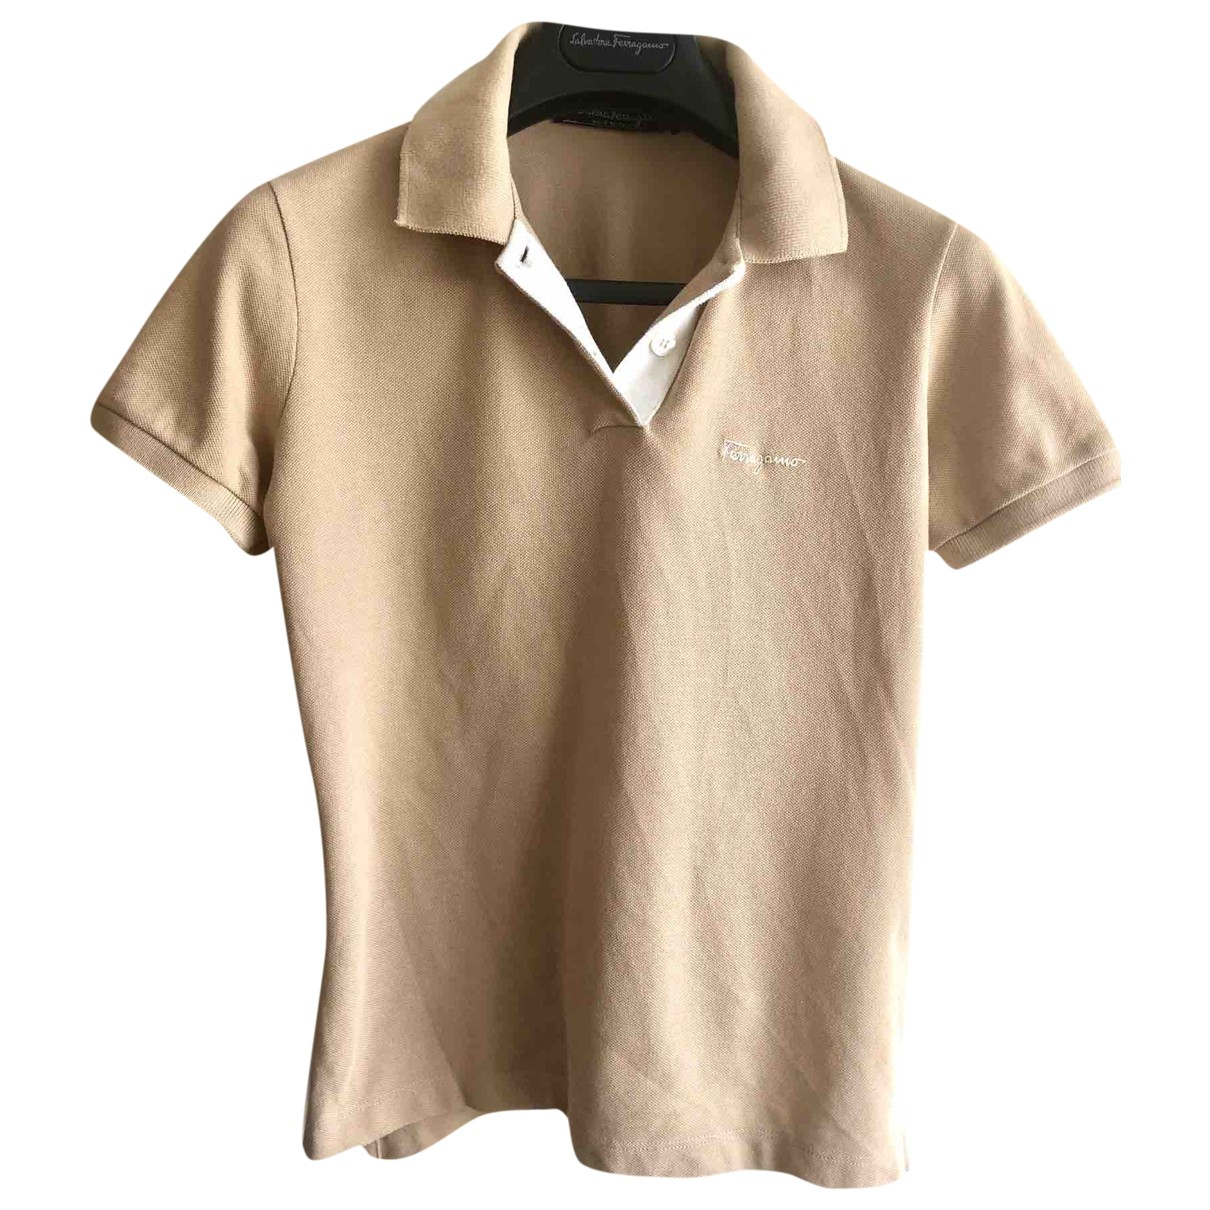 Salvatore Ferragamo \N Beige Cotton  top for Women 36 FR